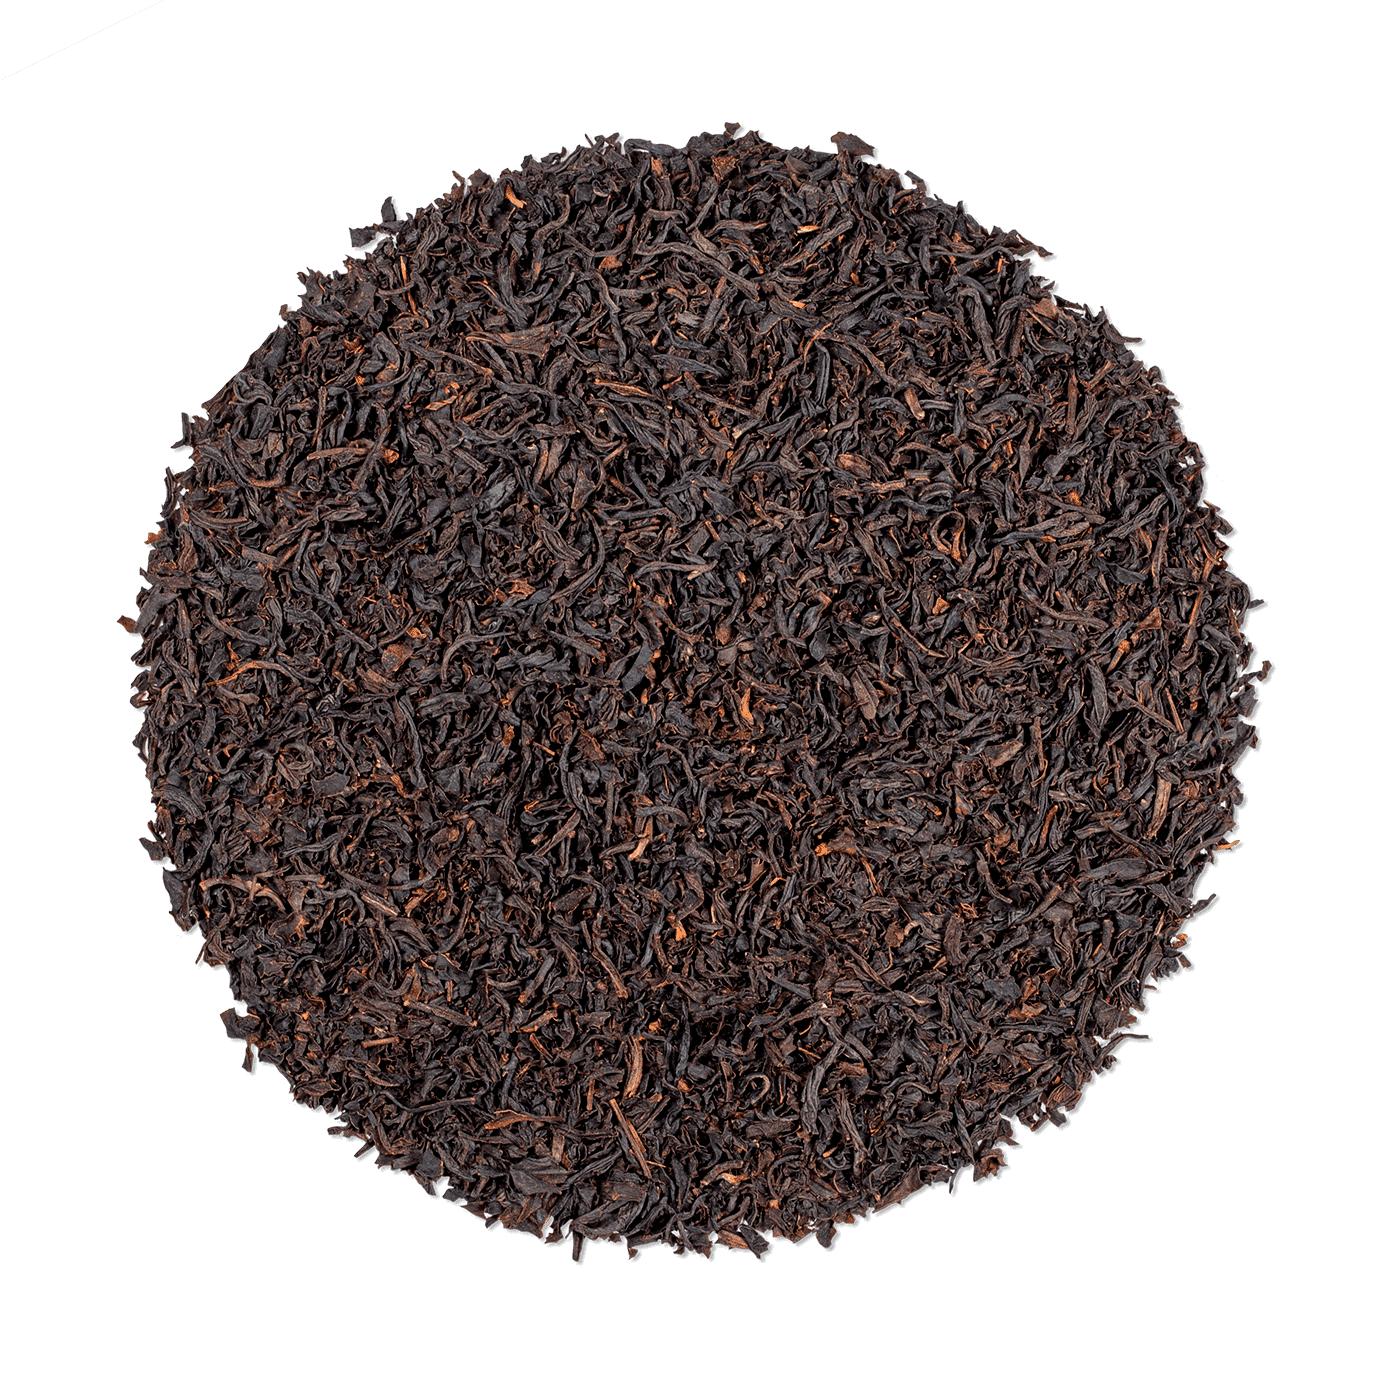 KUSMI TEA English Breakfast bio - Thé noir de Ceylan, Assam - Thé en vrac - Kusmi Tea